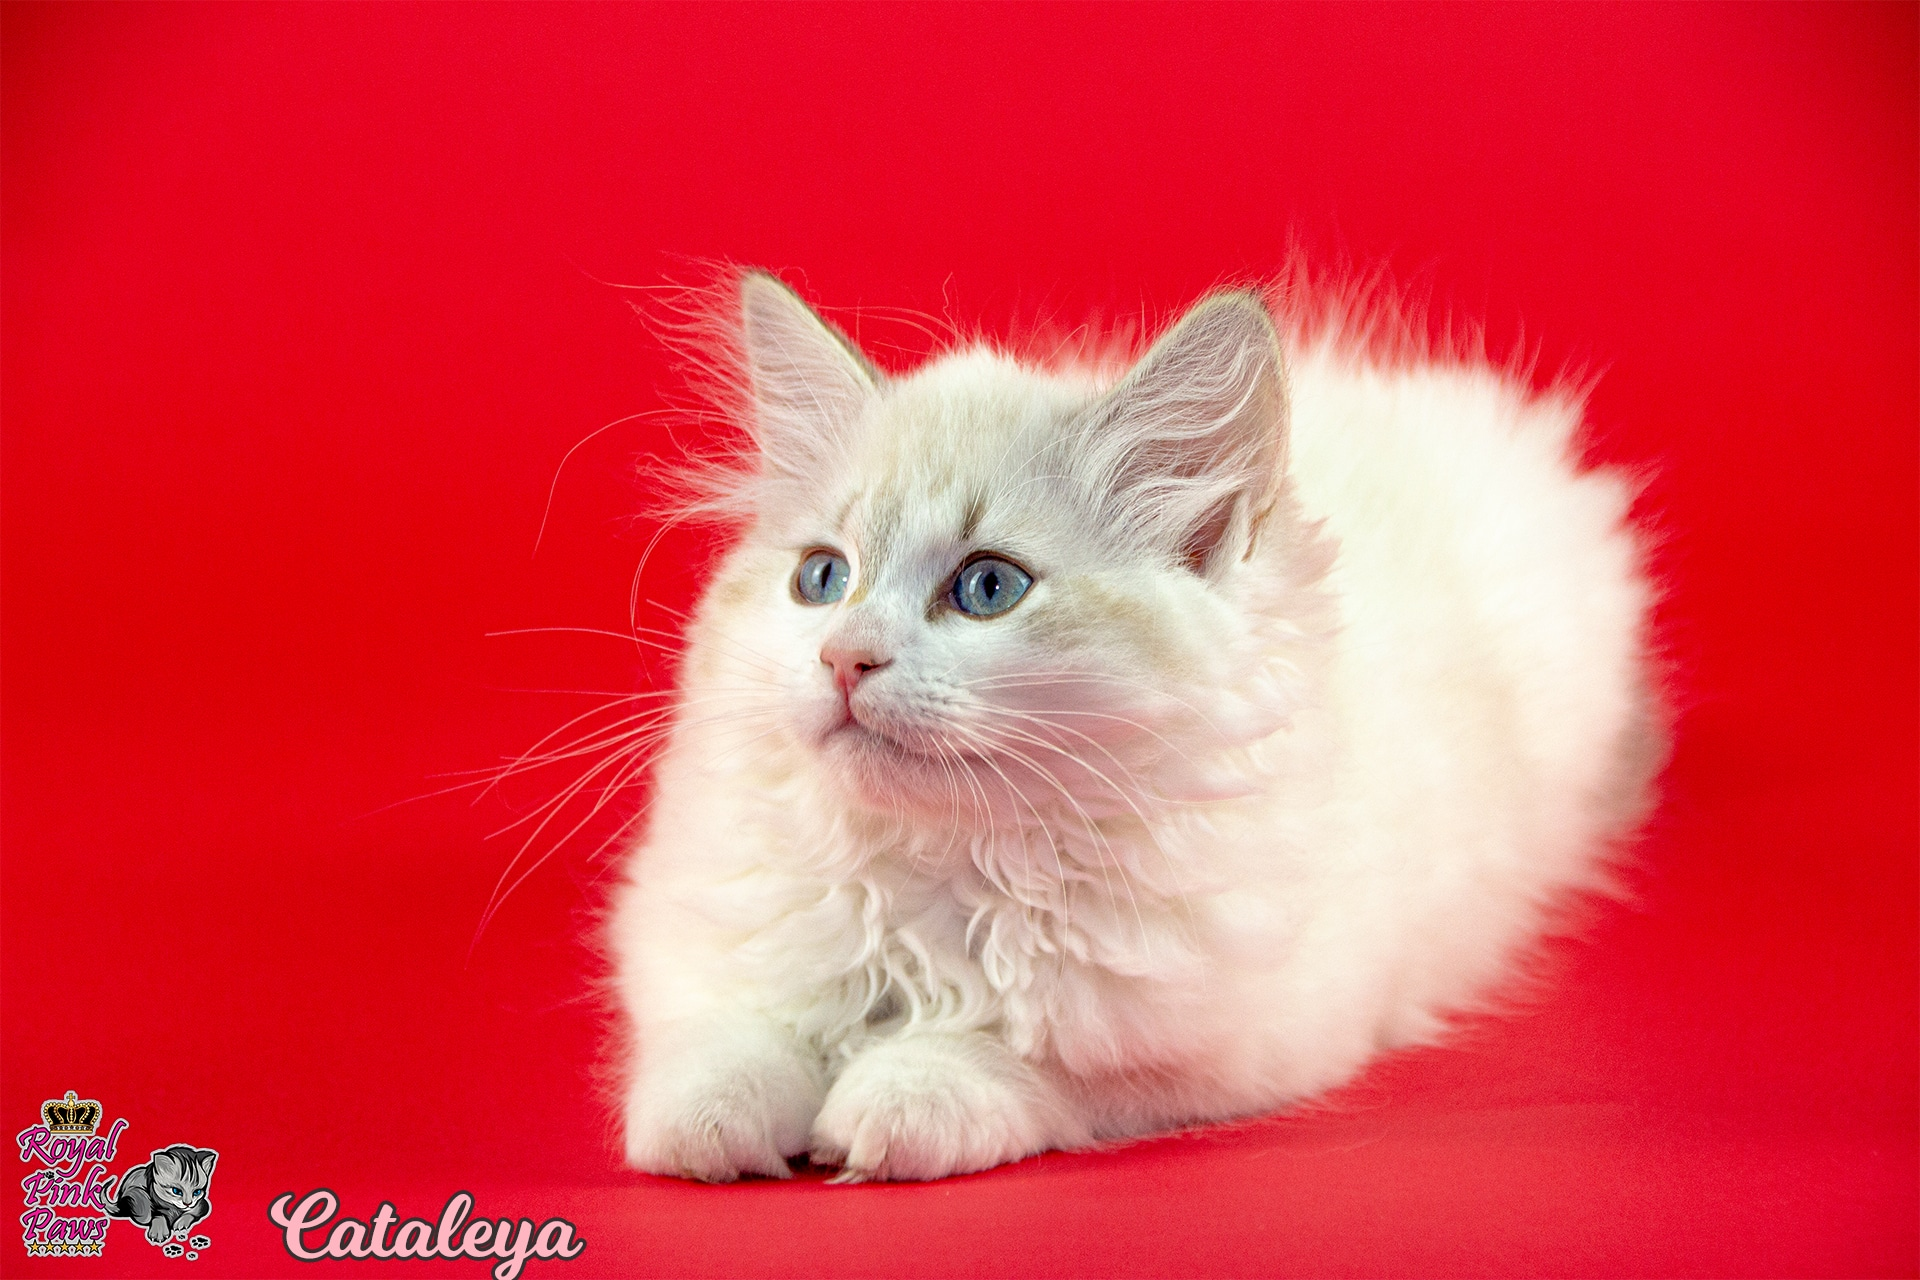 Neva Masquarade - Cataleya Royal Pink Paws